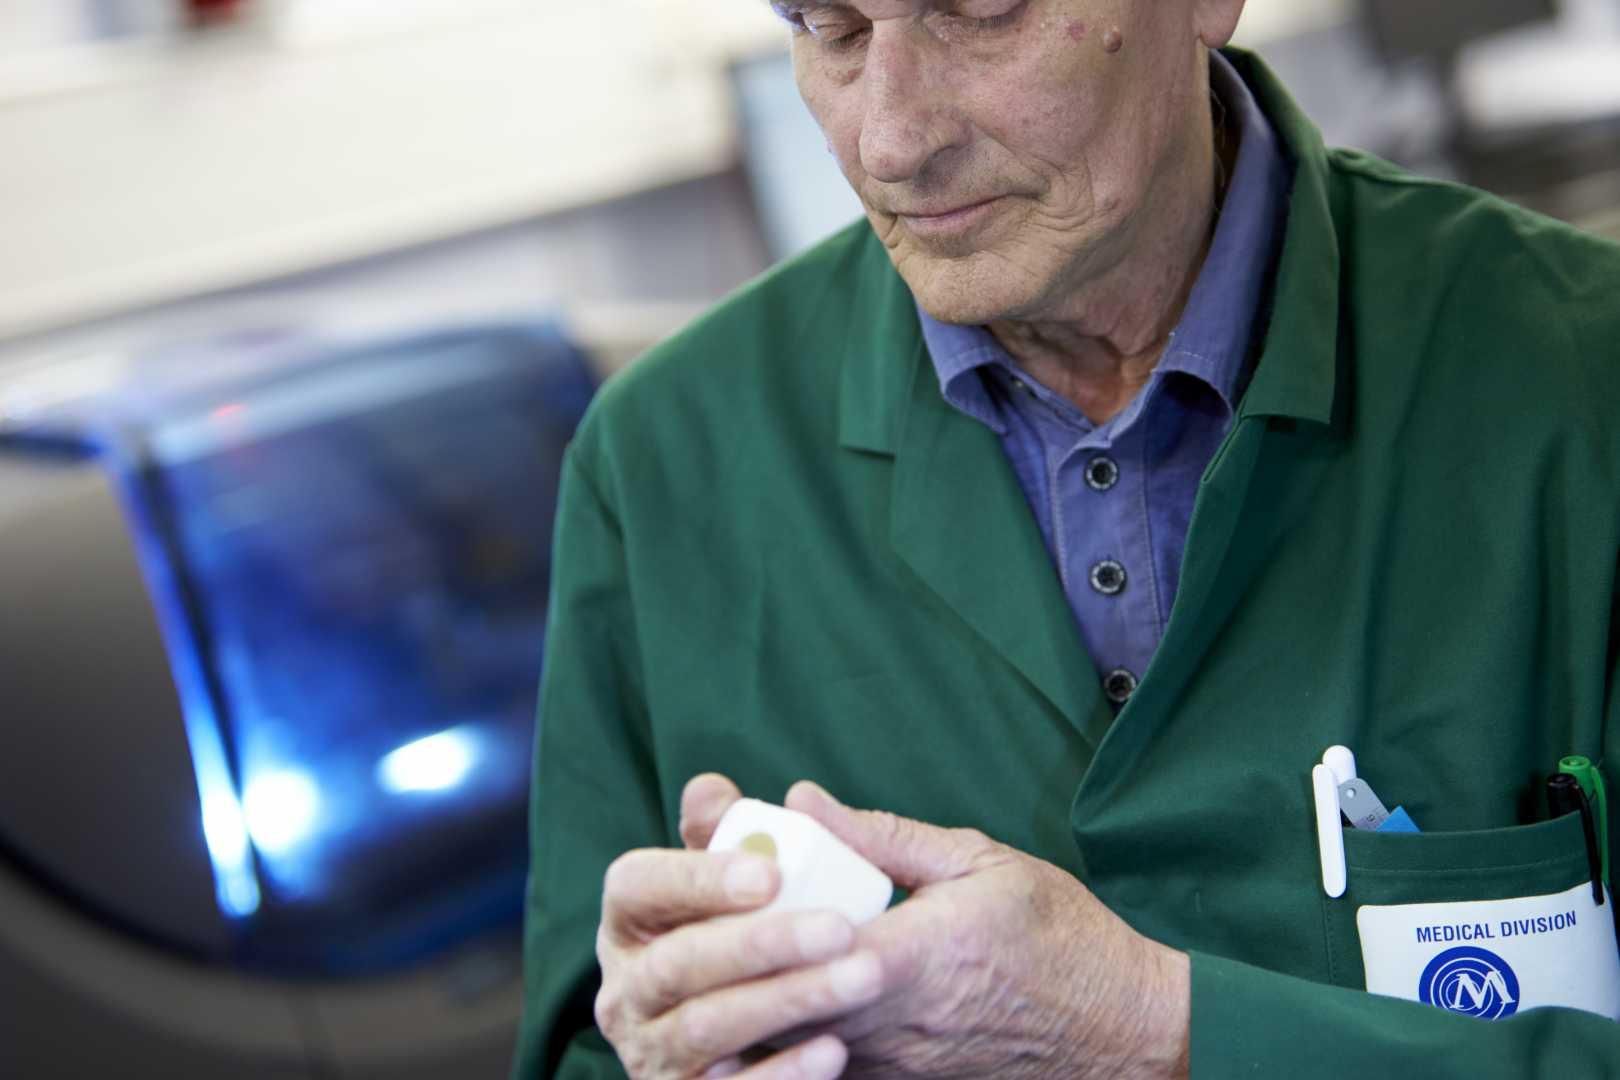 Owen Mumford: Behind the scenes: R&D in medical device design 2